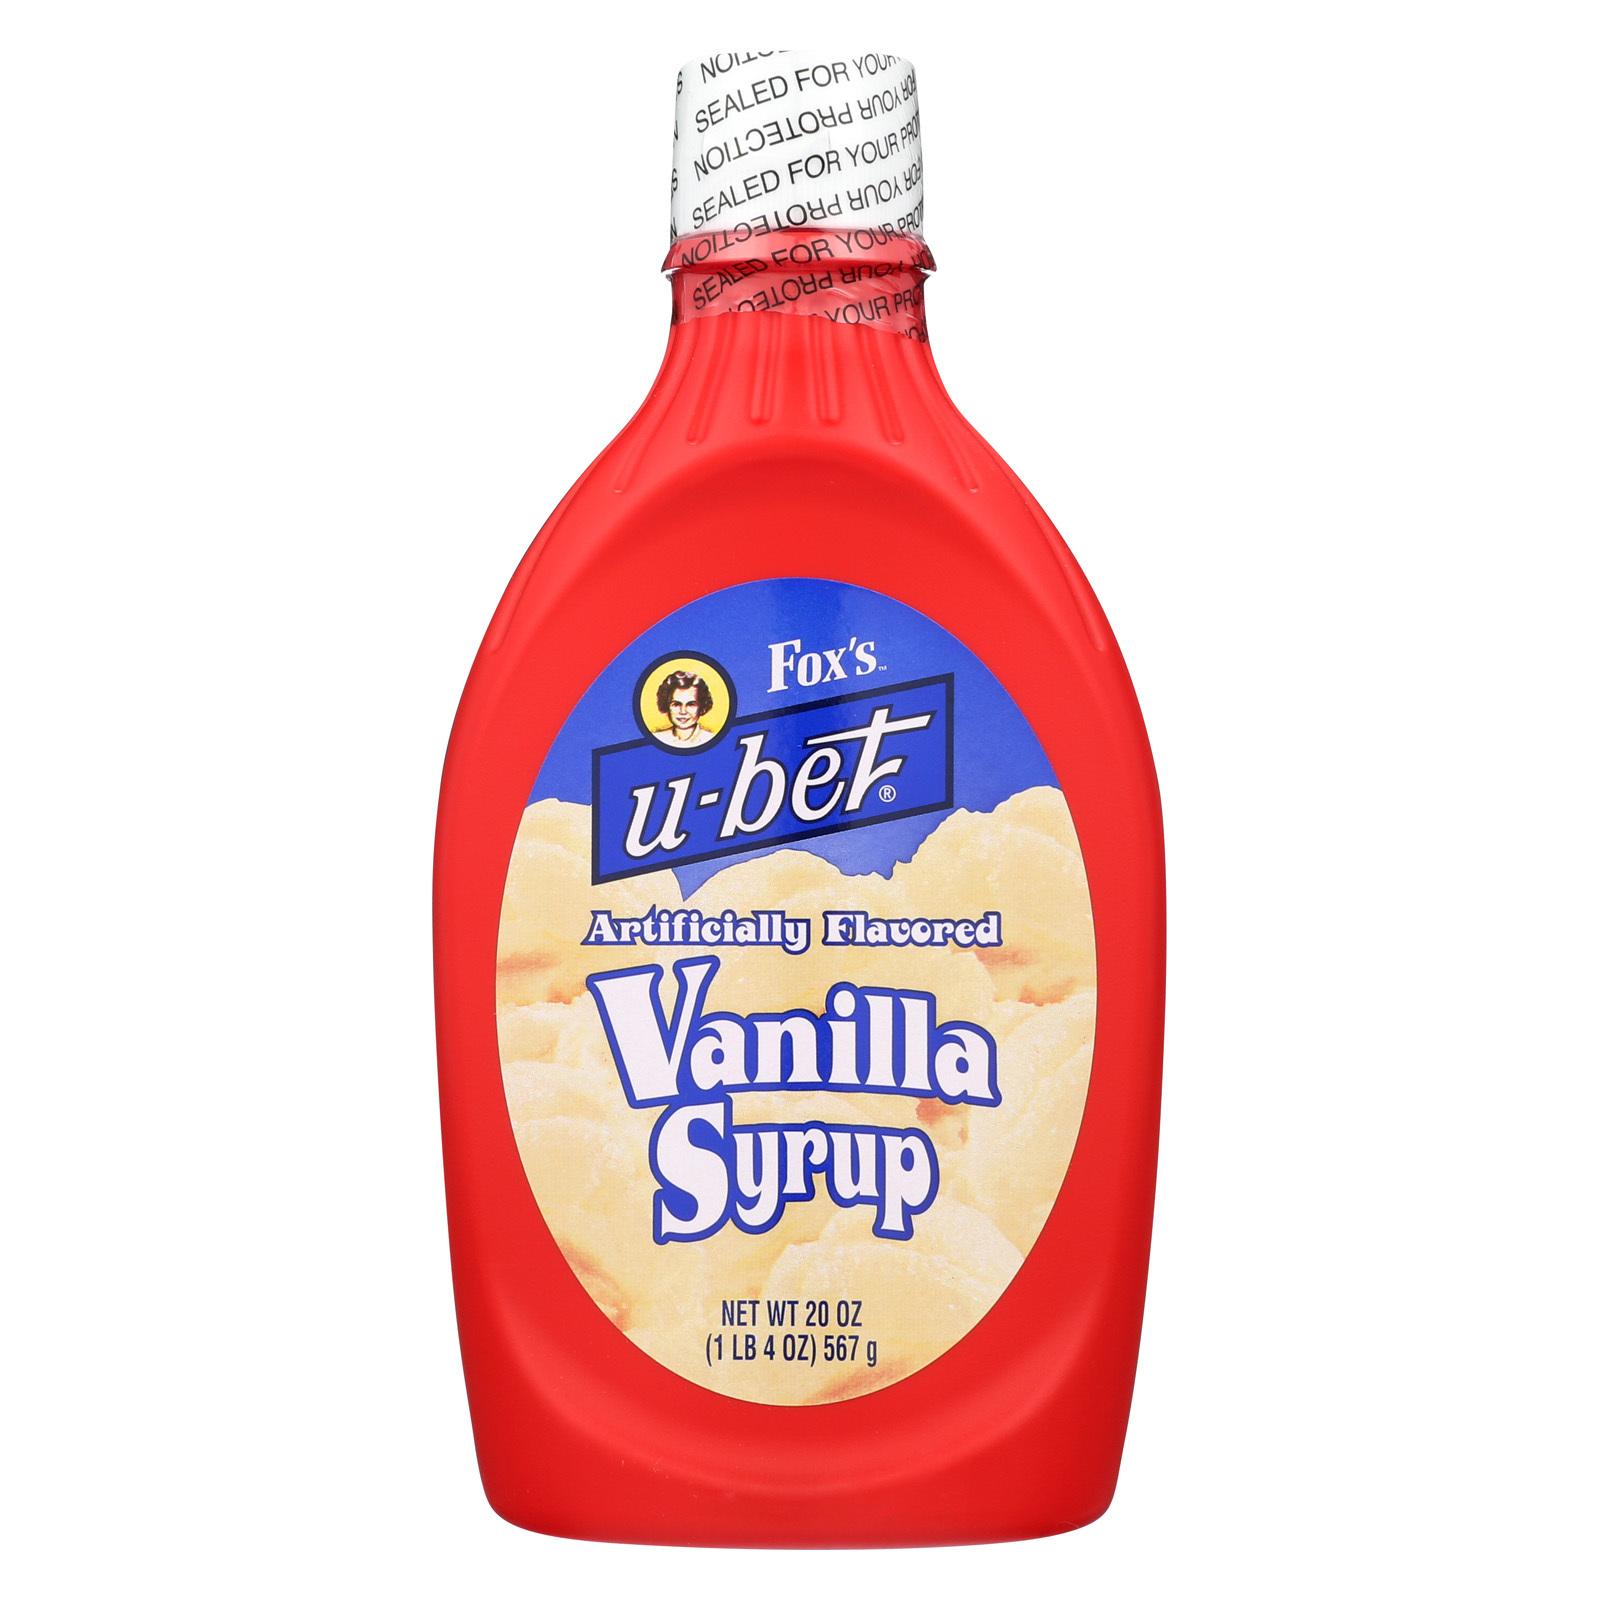 Fox's U - Bet Vanilla Syrup - Vanilla - Case of 12 - 20 oz.